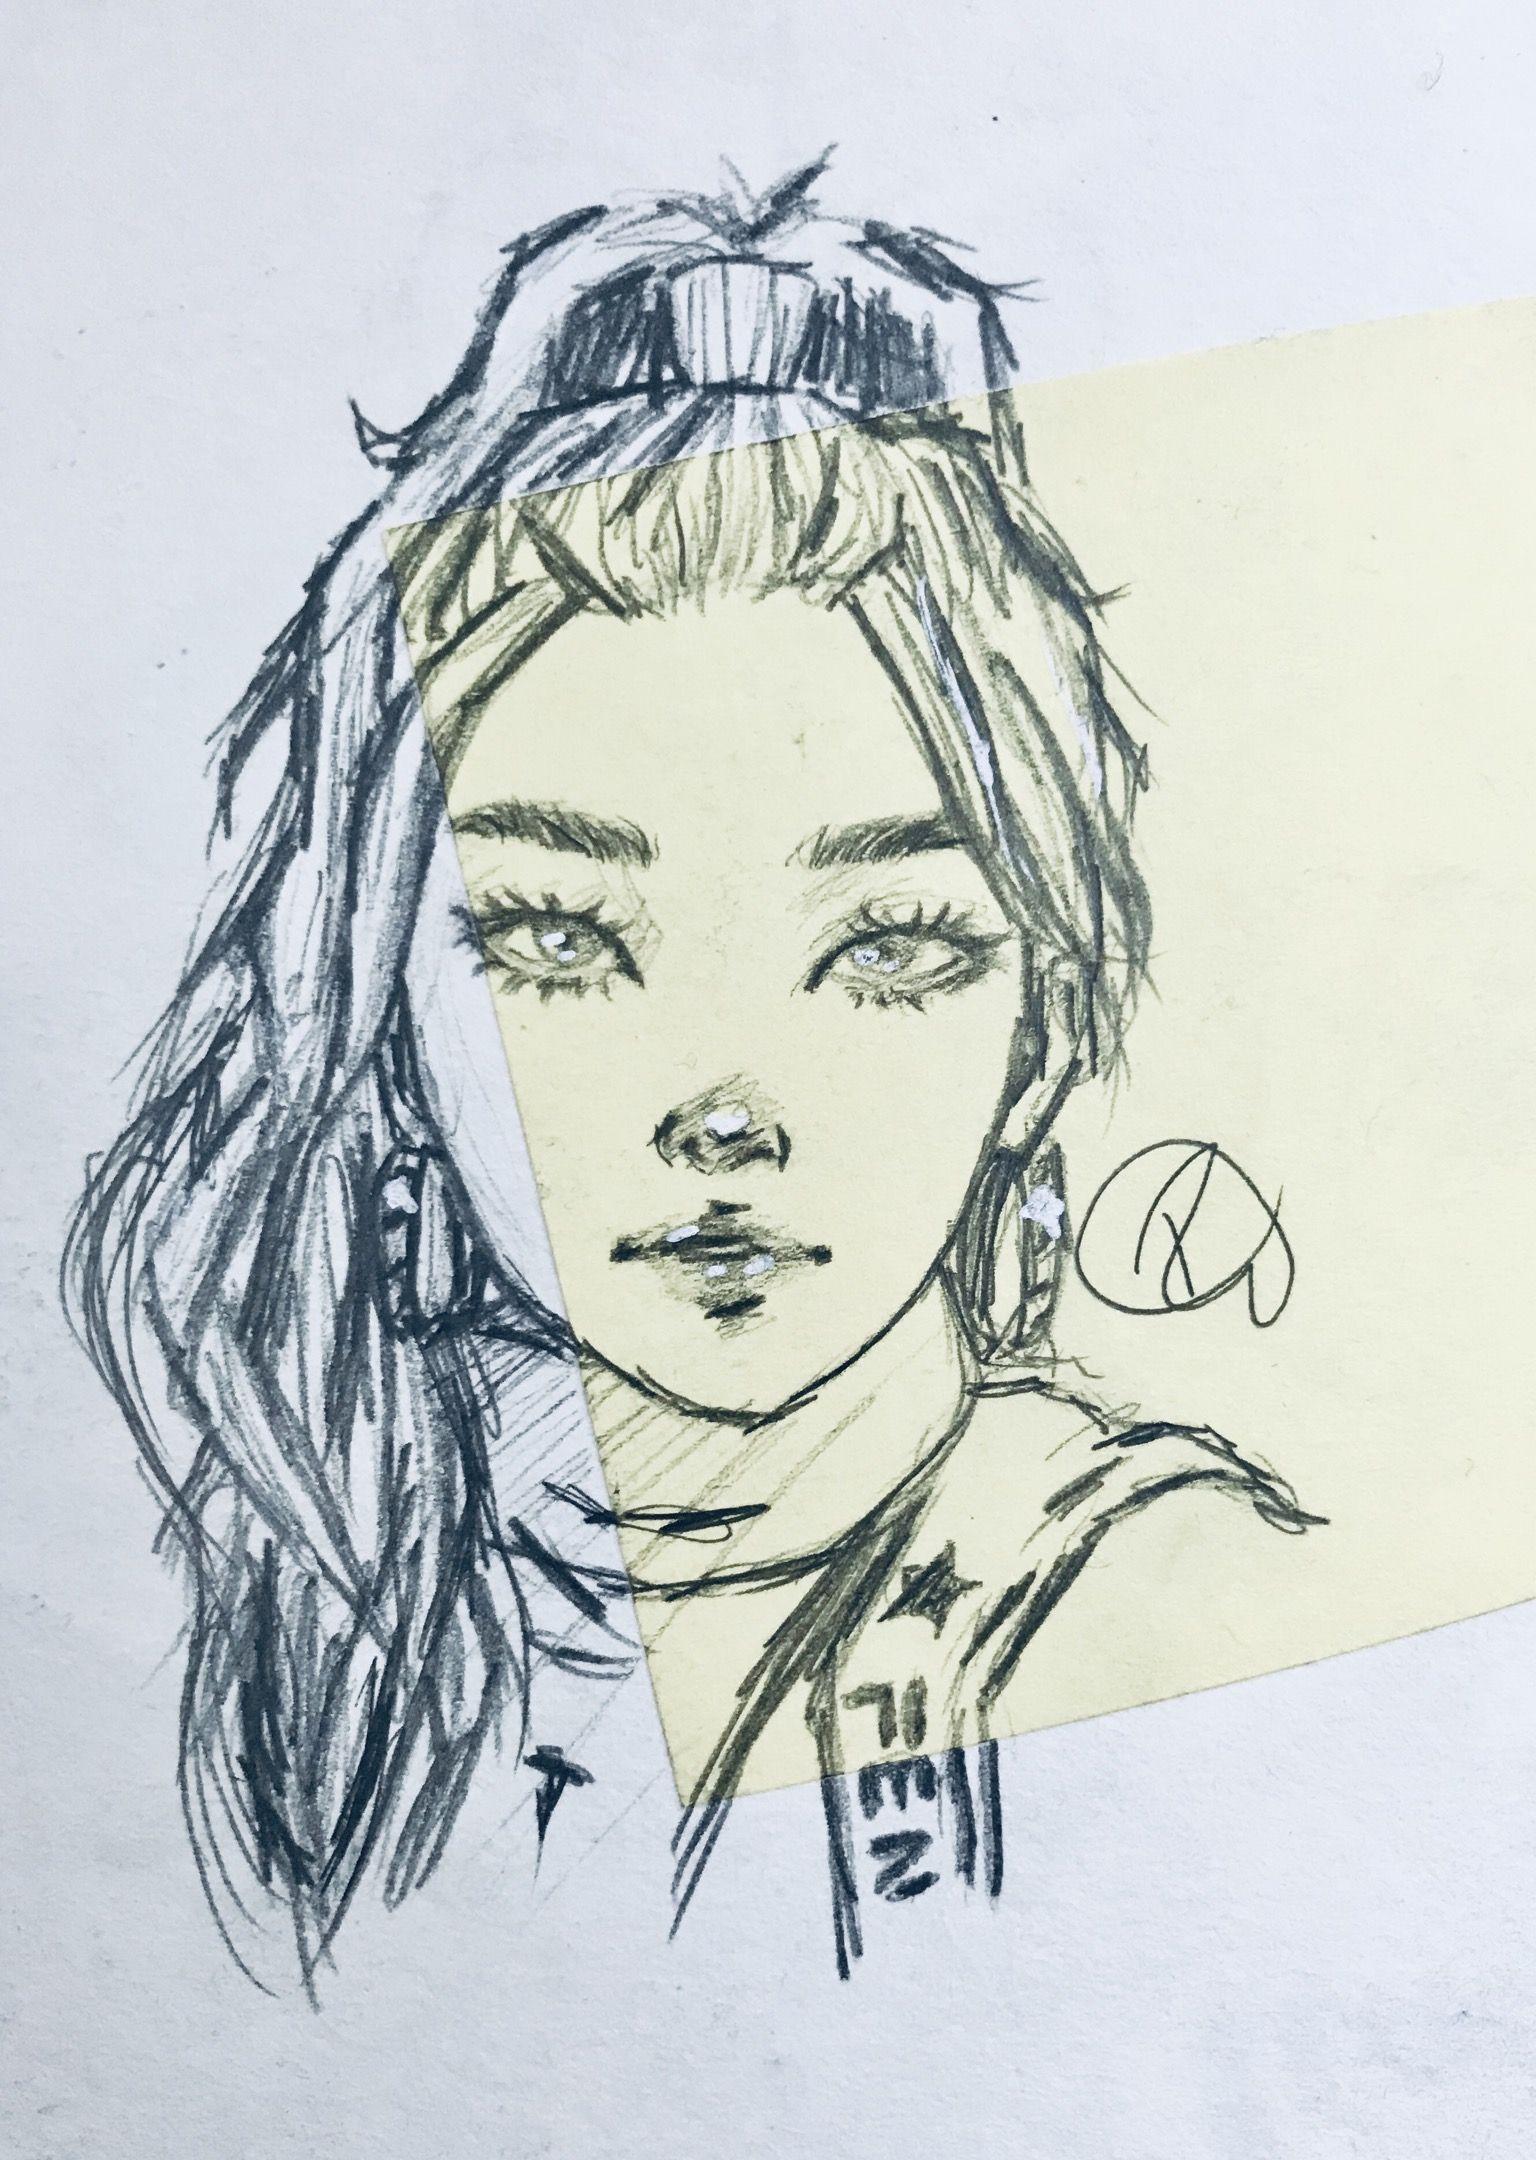 A Quick Random Sketch Art Sketch Draw Drawing Cool Sketching Drawing Sketches Girl Drawing Sketches Drawings